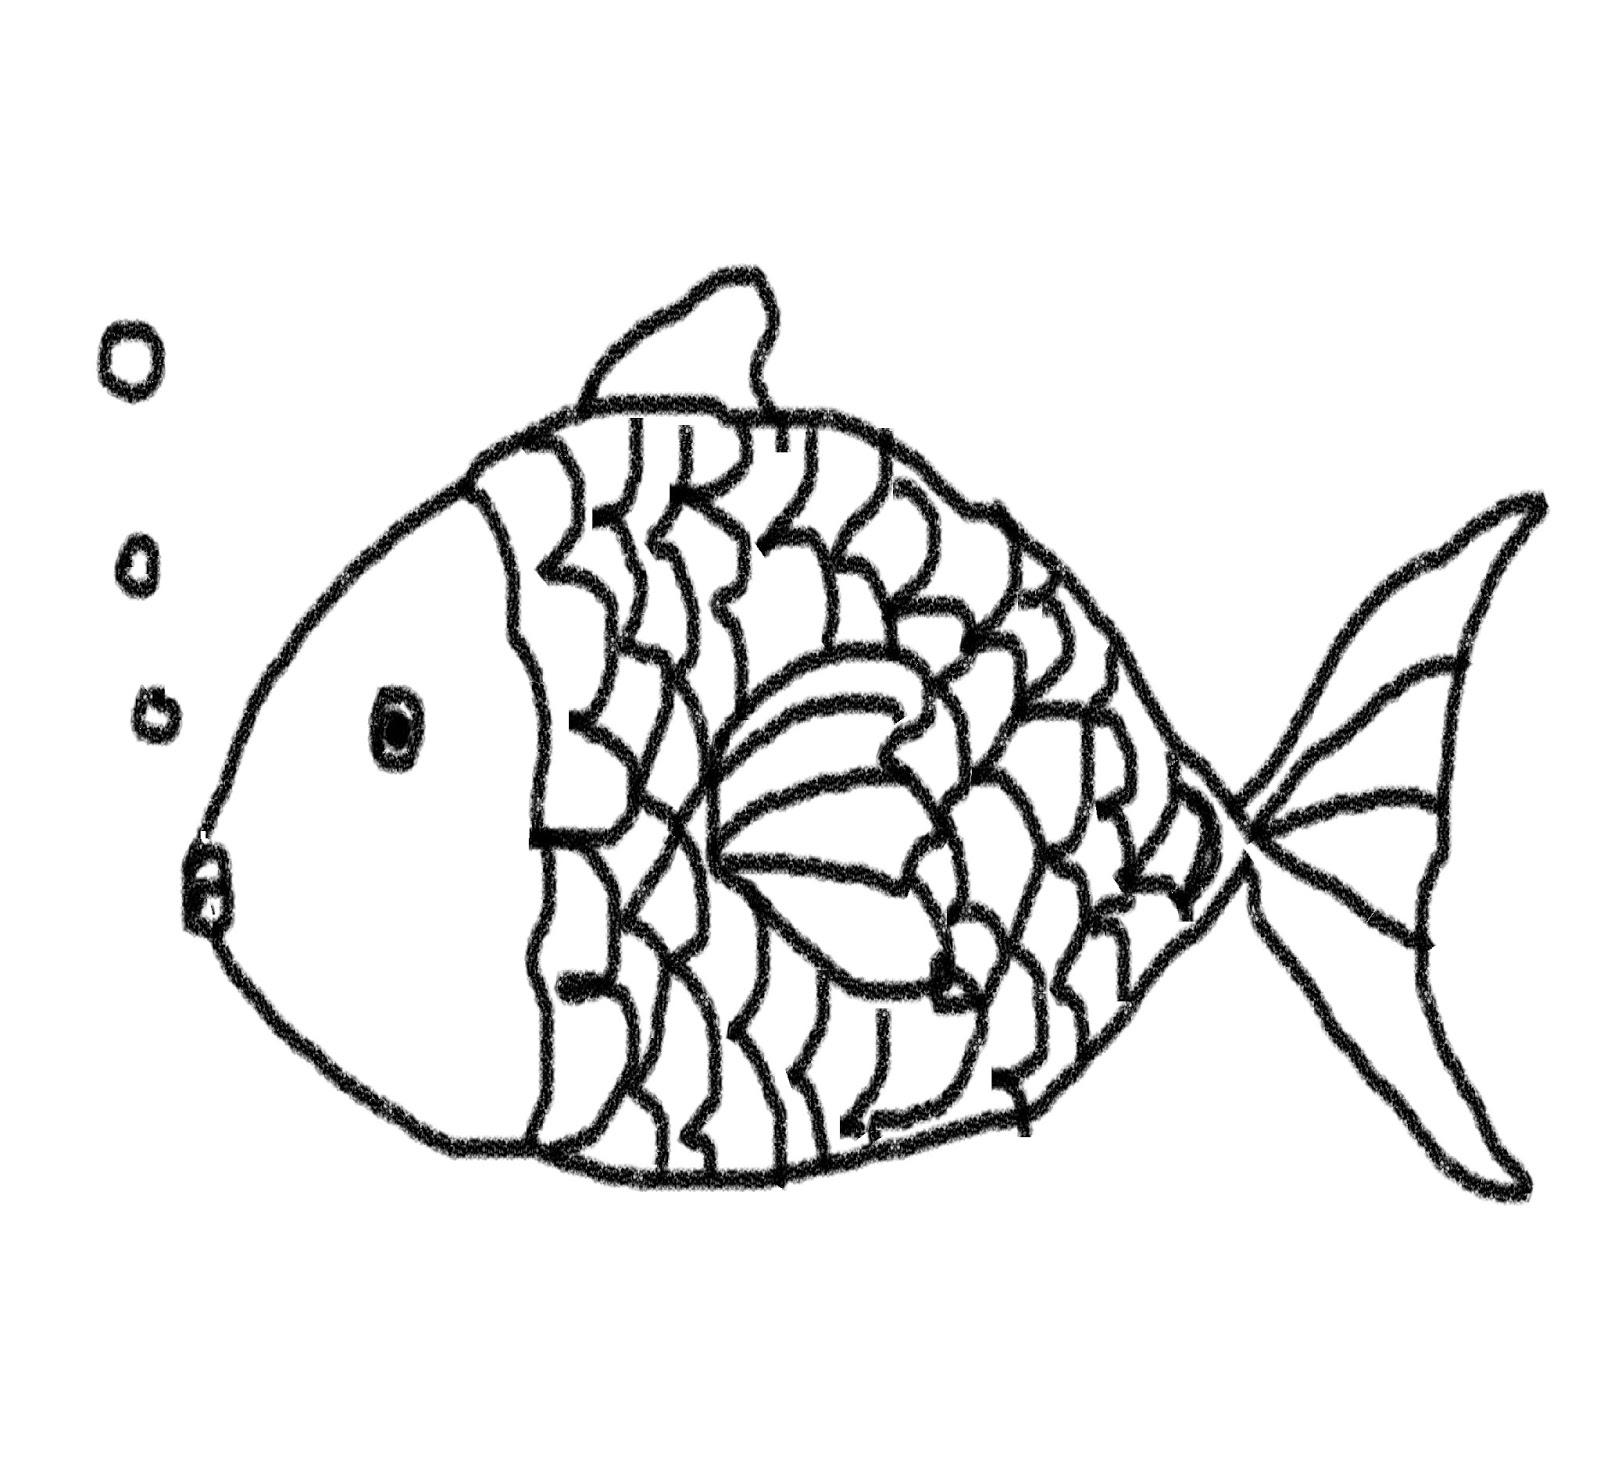 Fish Line Drawings